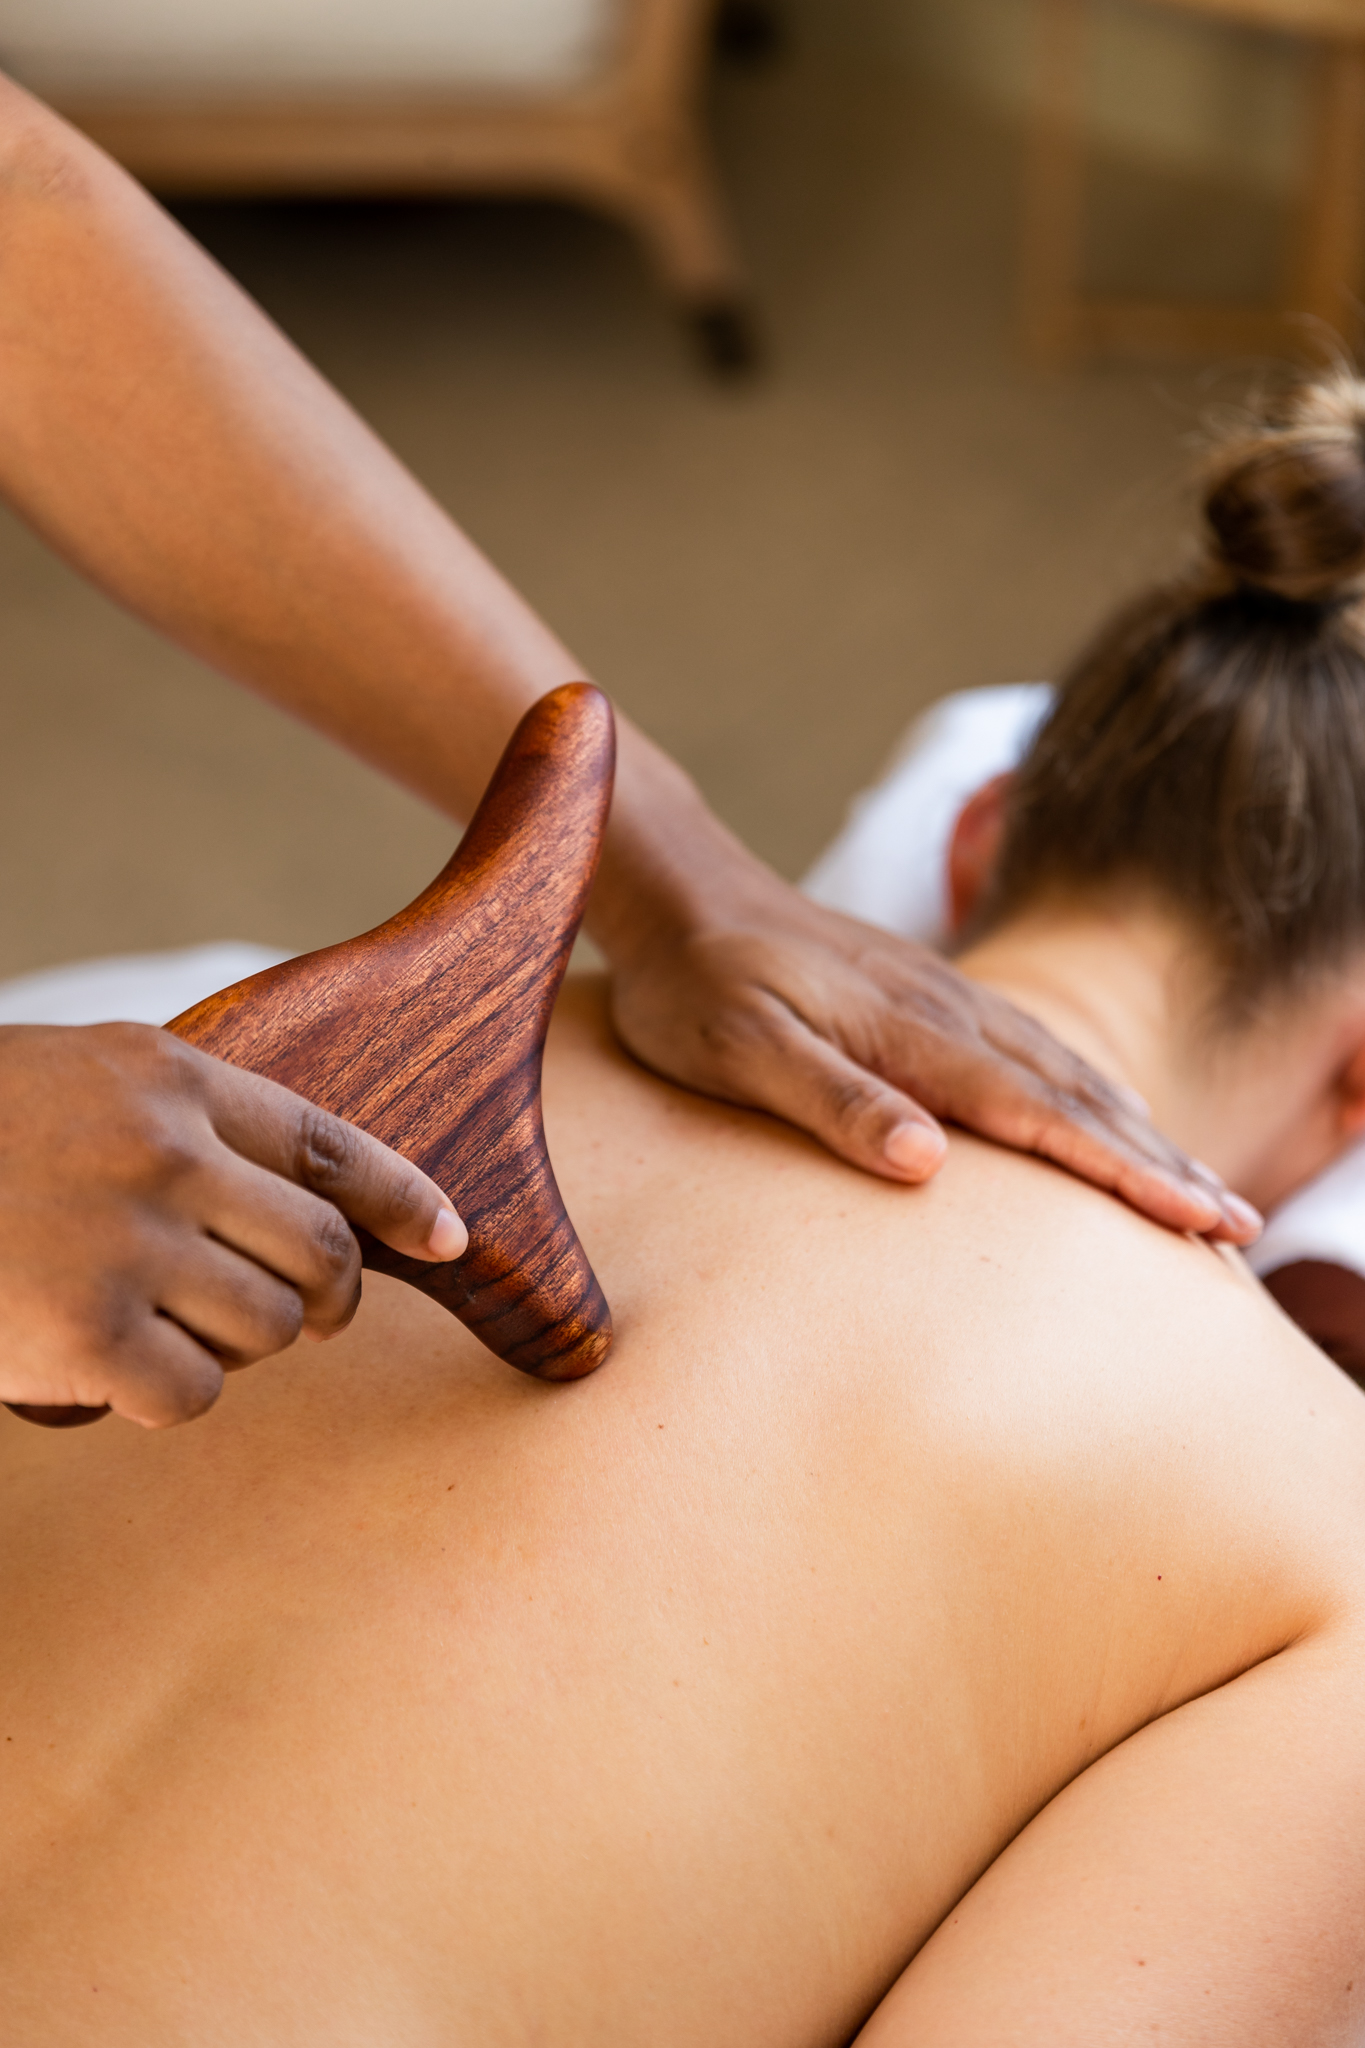 Female having a massage using wooden massage sticks at Delaire Graff Spa